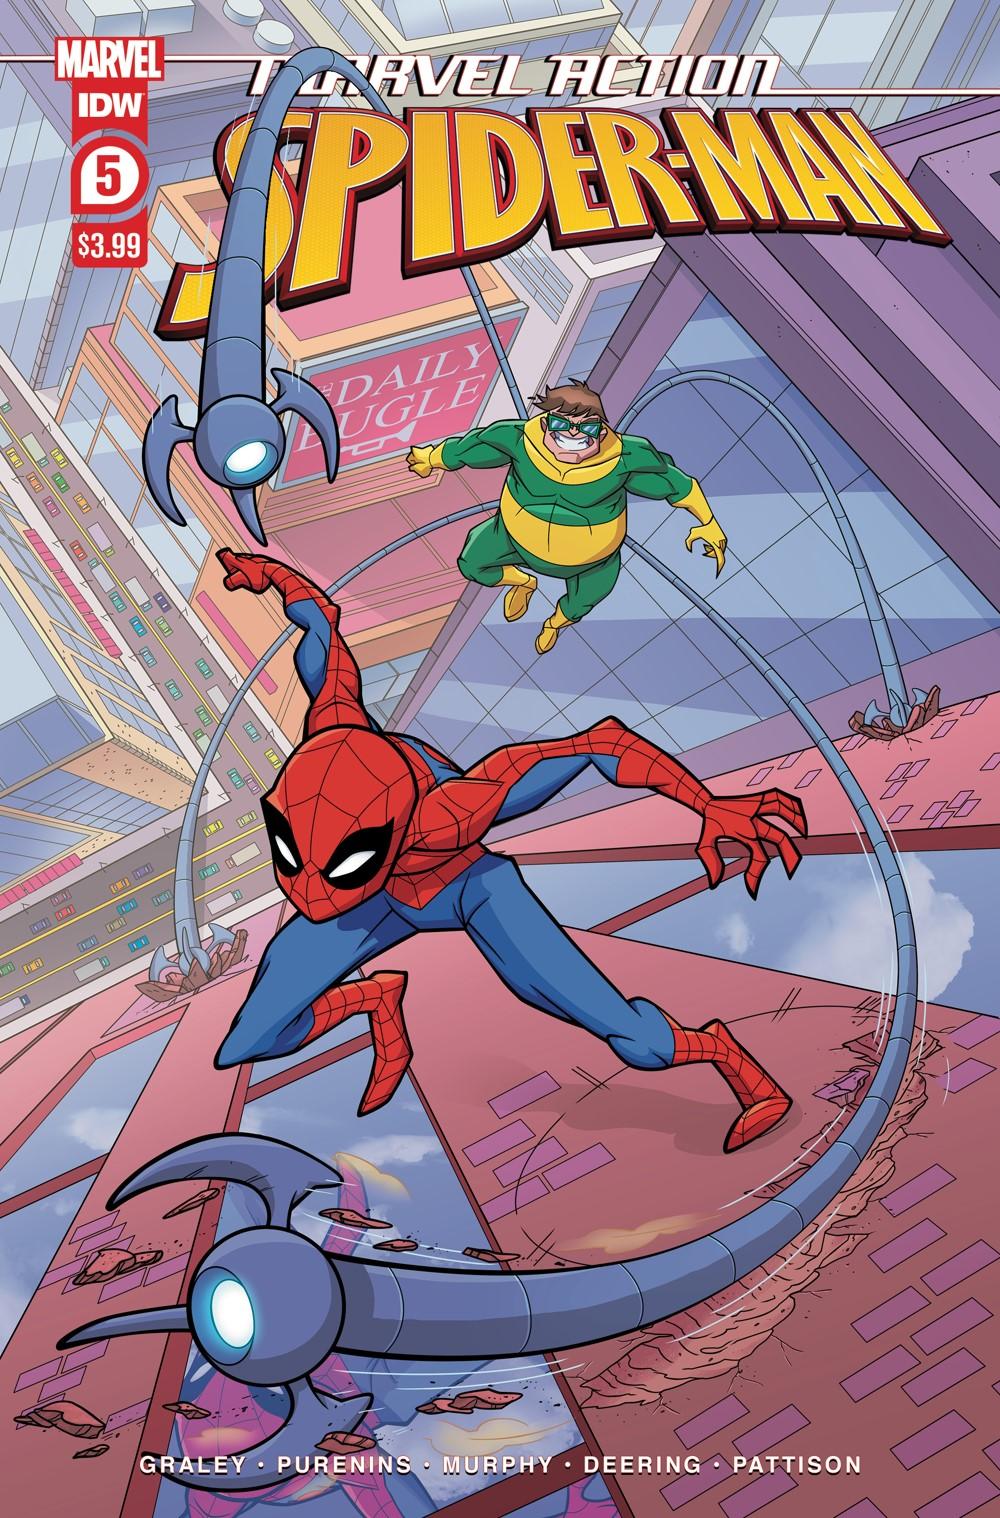 SpidermanV3-05_cvrA ComicList Previews: MARVEL ACTION SPIDER-MAN VOLUME 3 #5